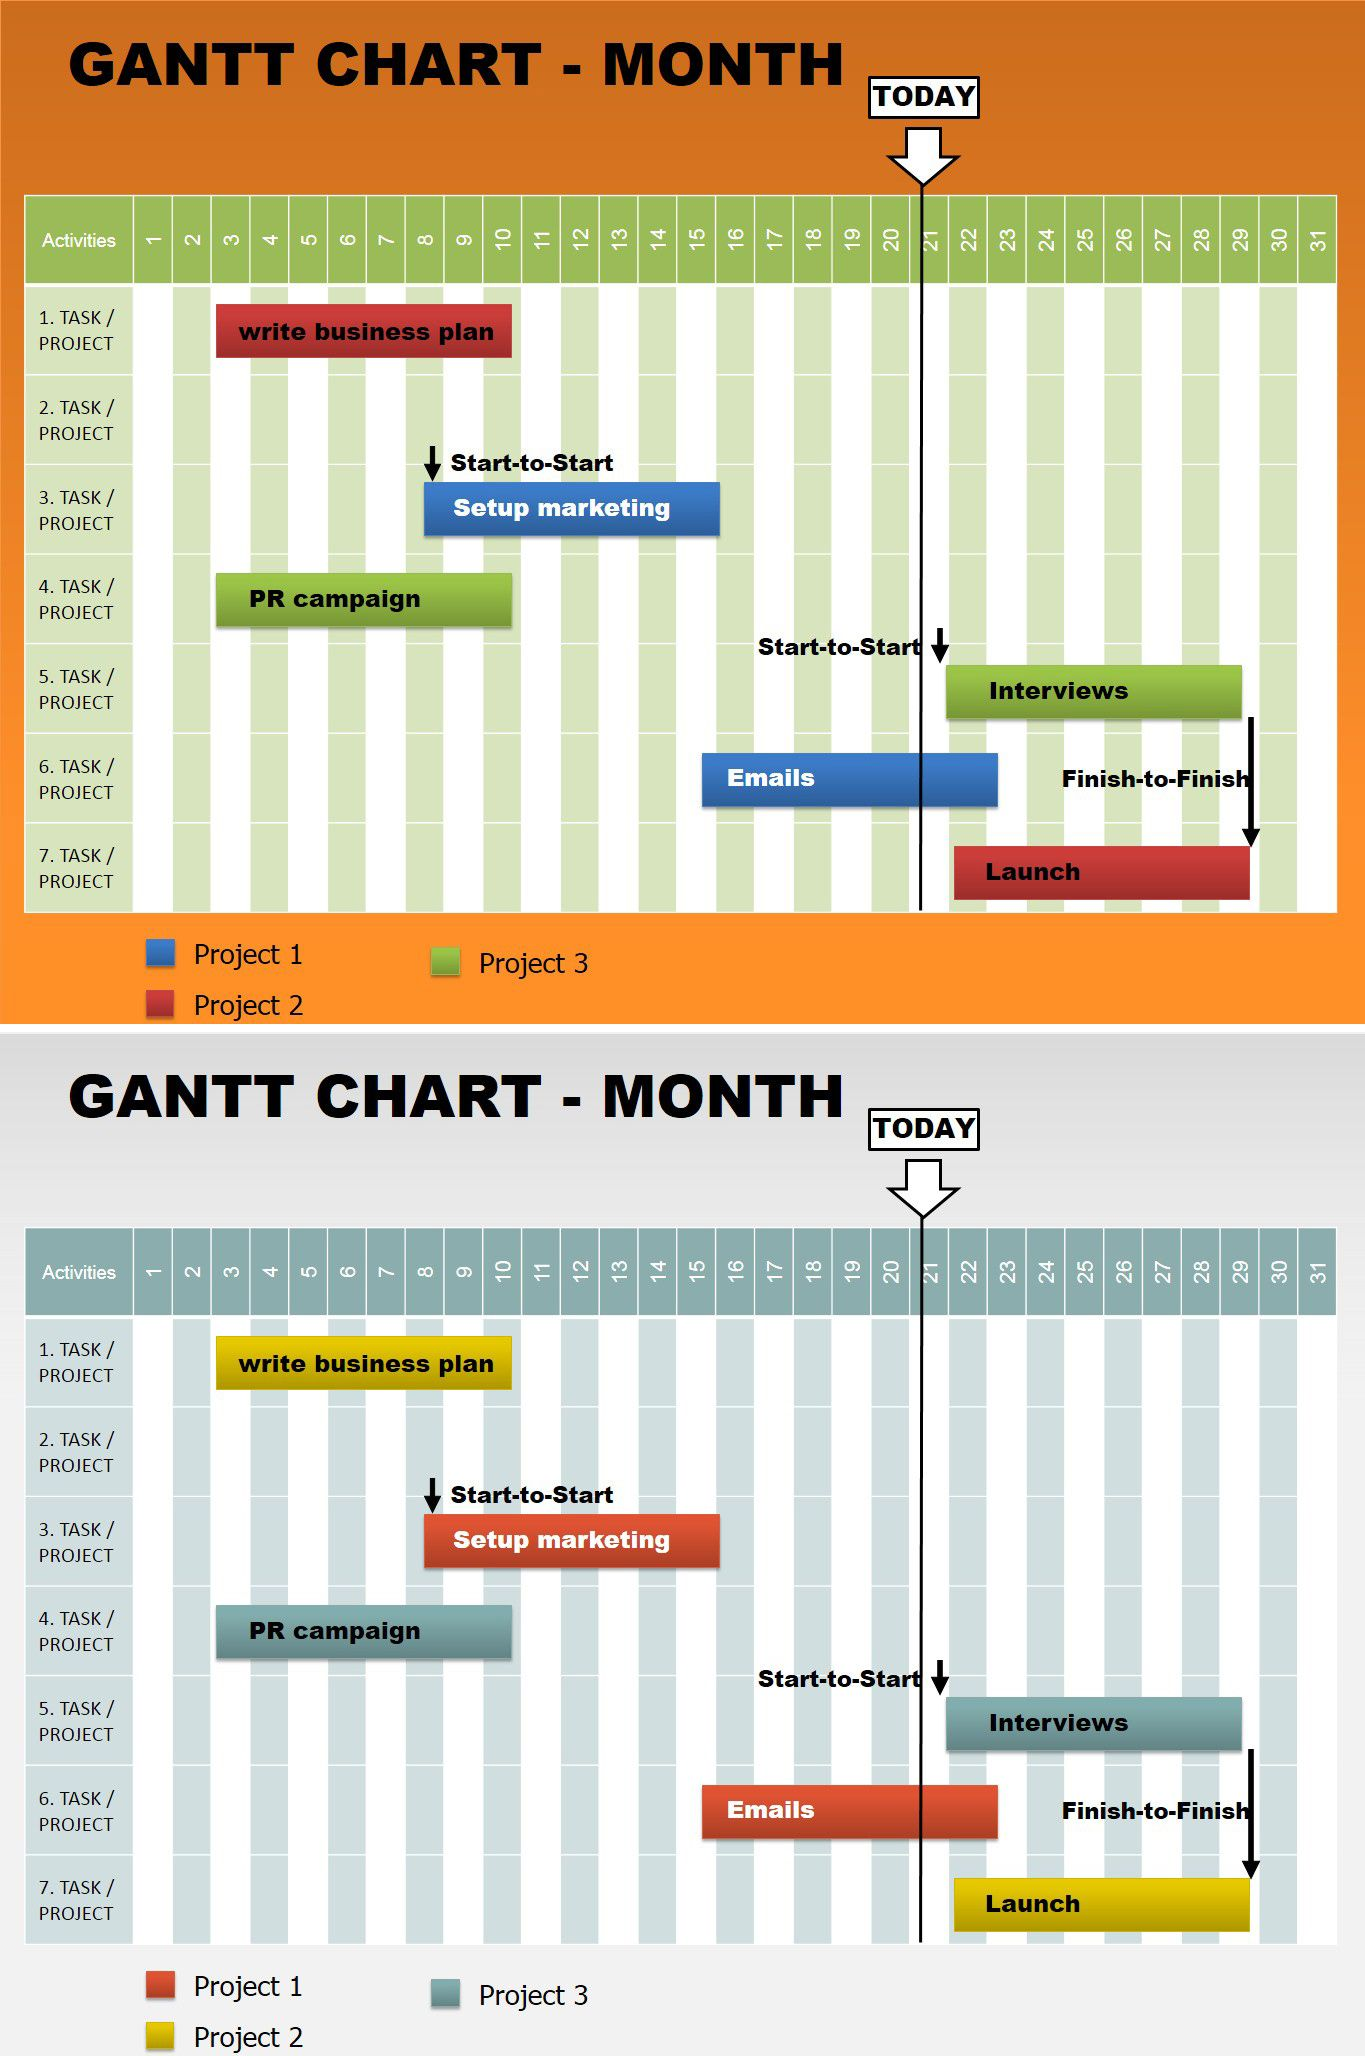 download month gantt free powerpoint charts   free powerpoint, Powerpoint templates